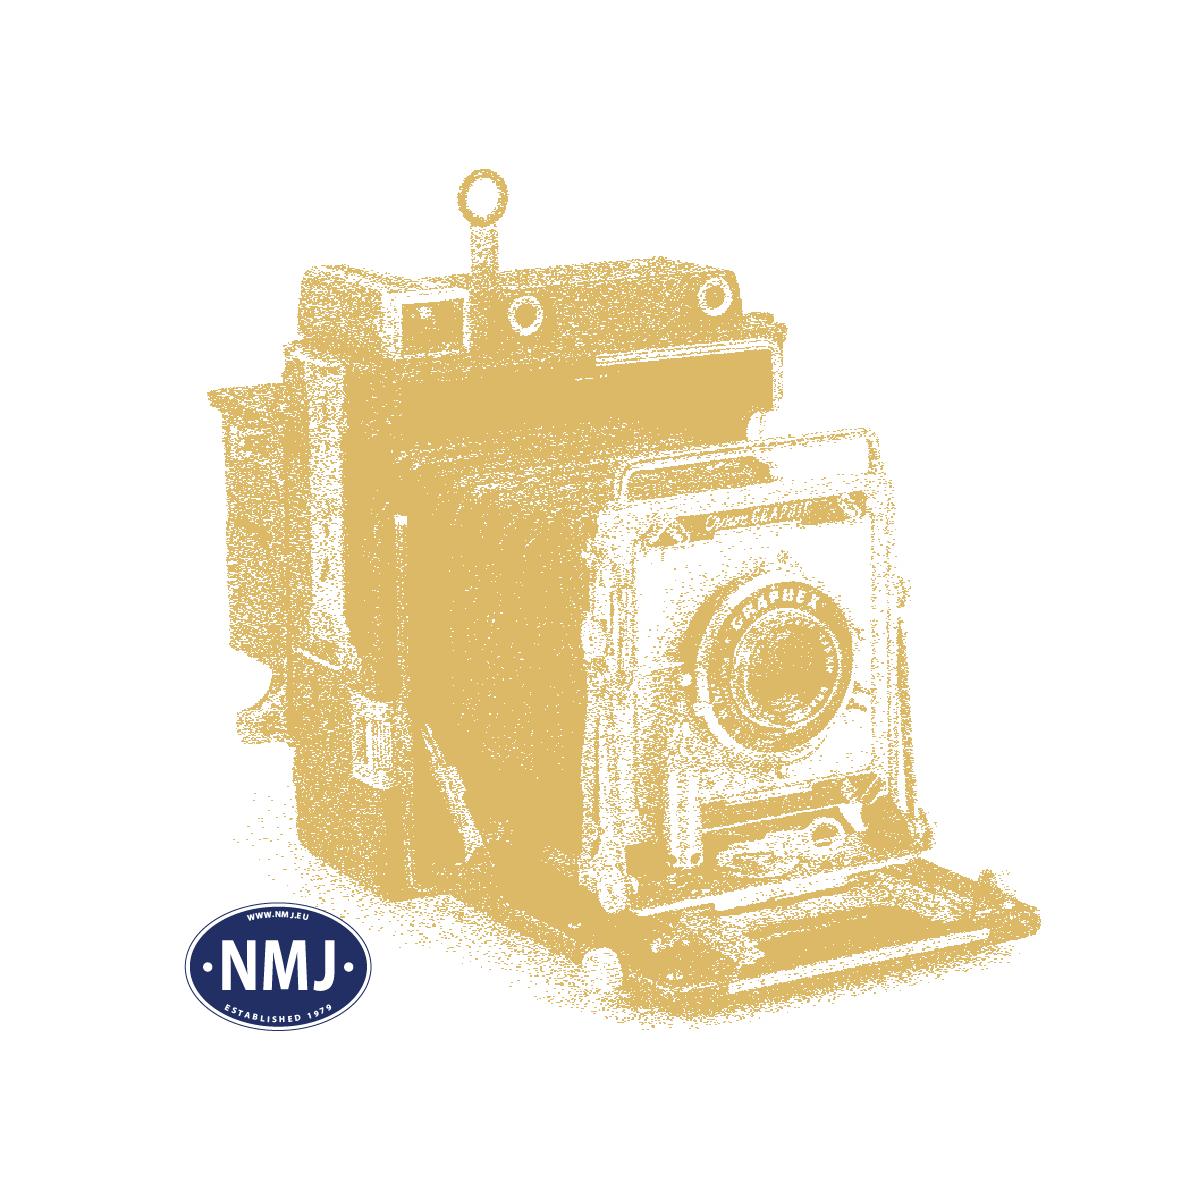 NMJSE2.1180 - NMJ Superline SJ E2.1180